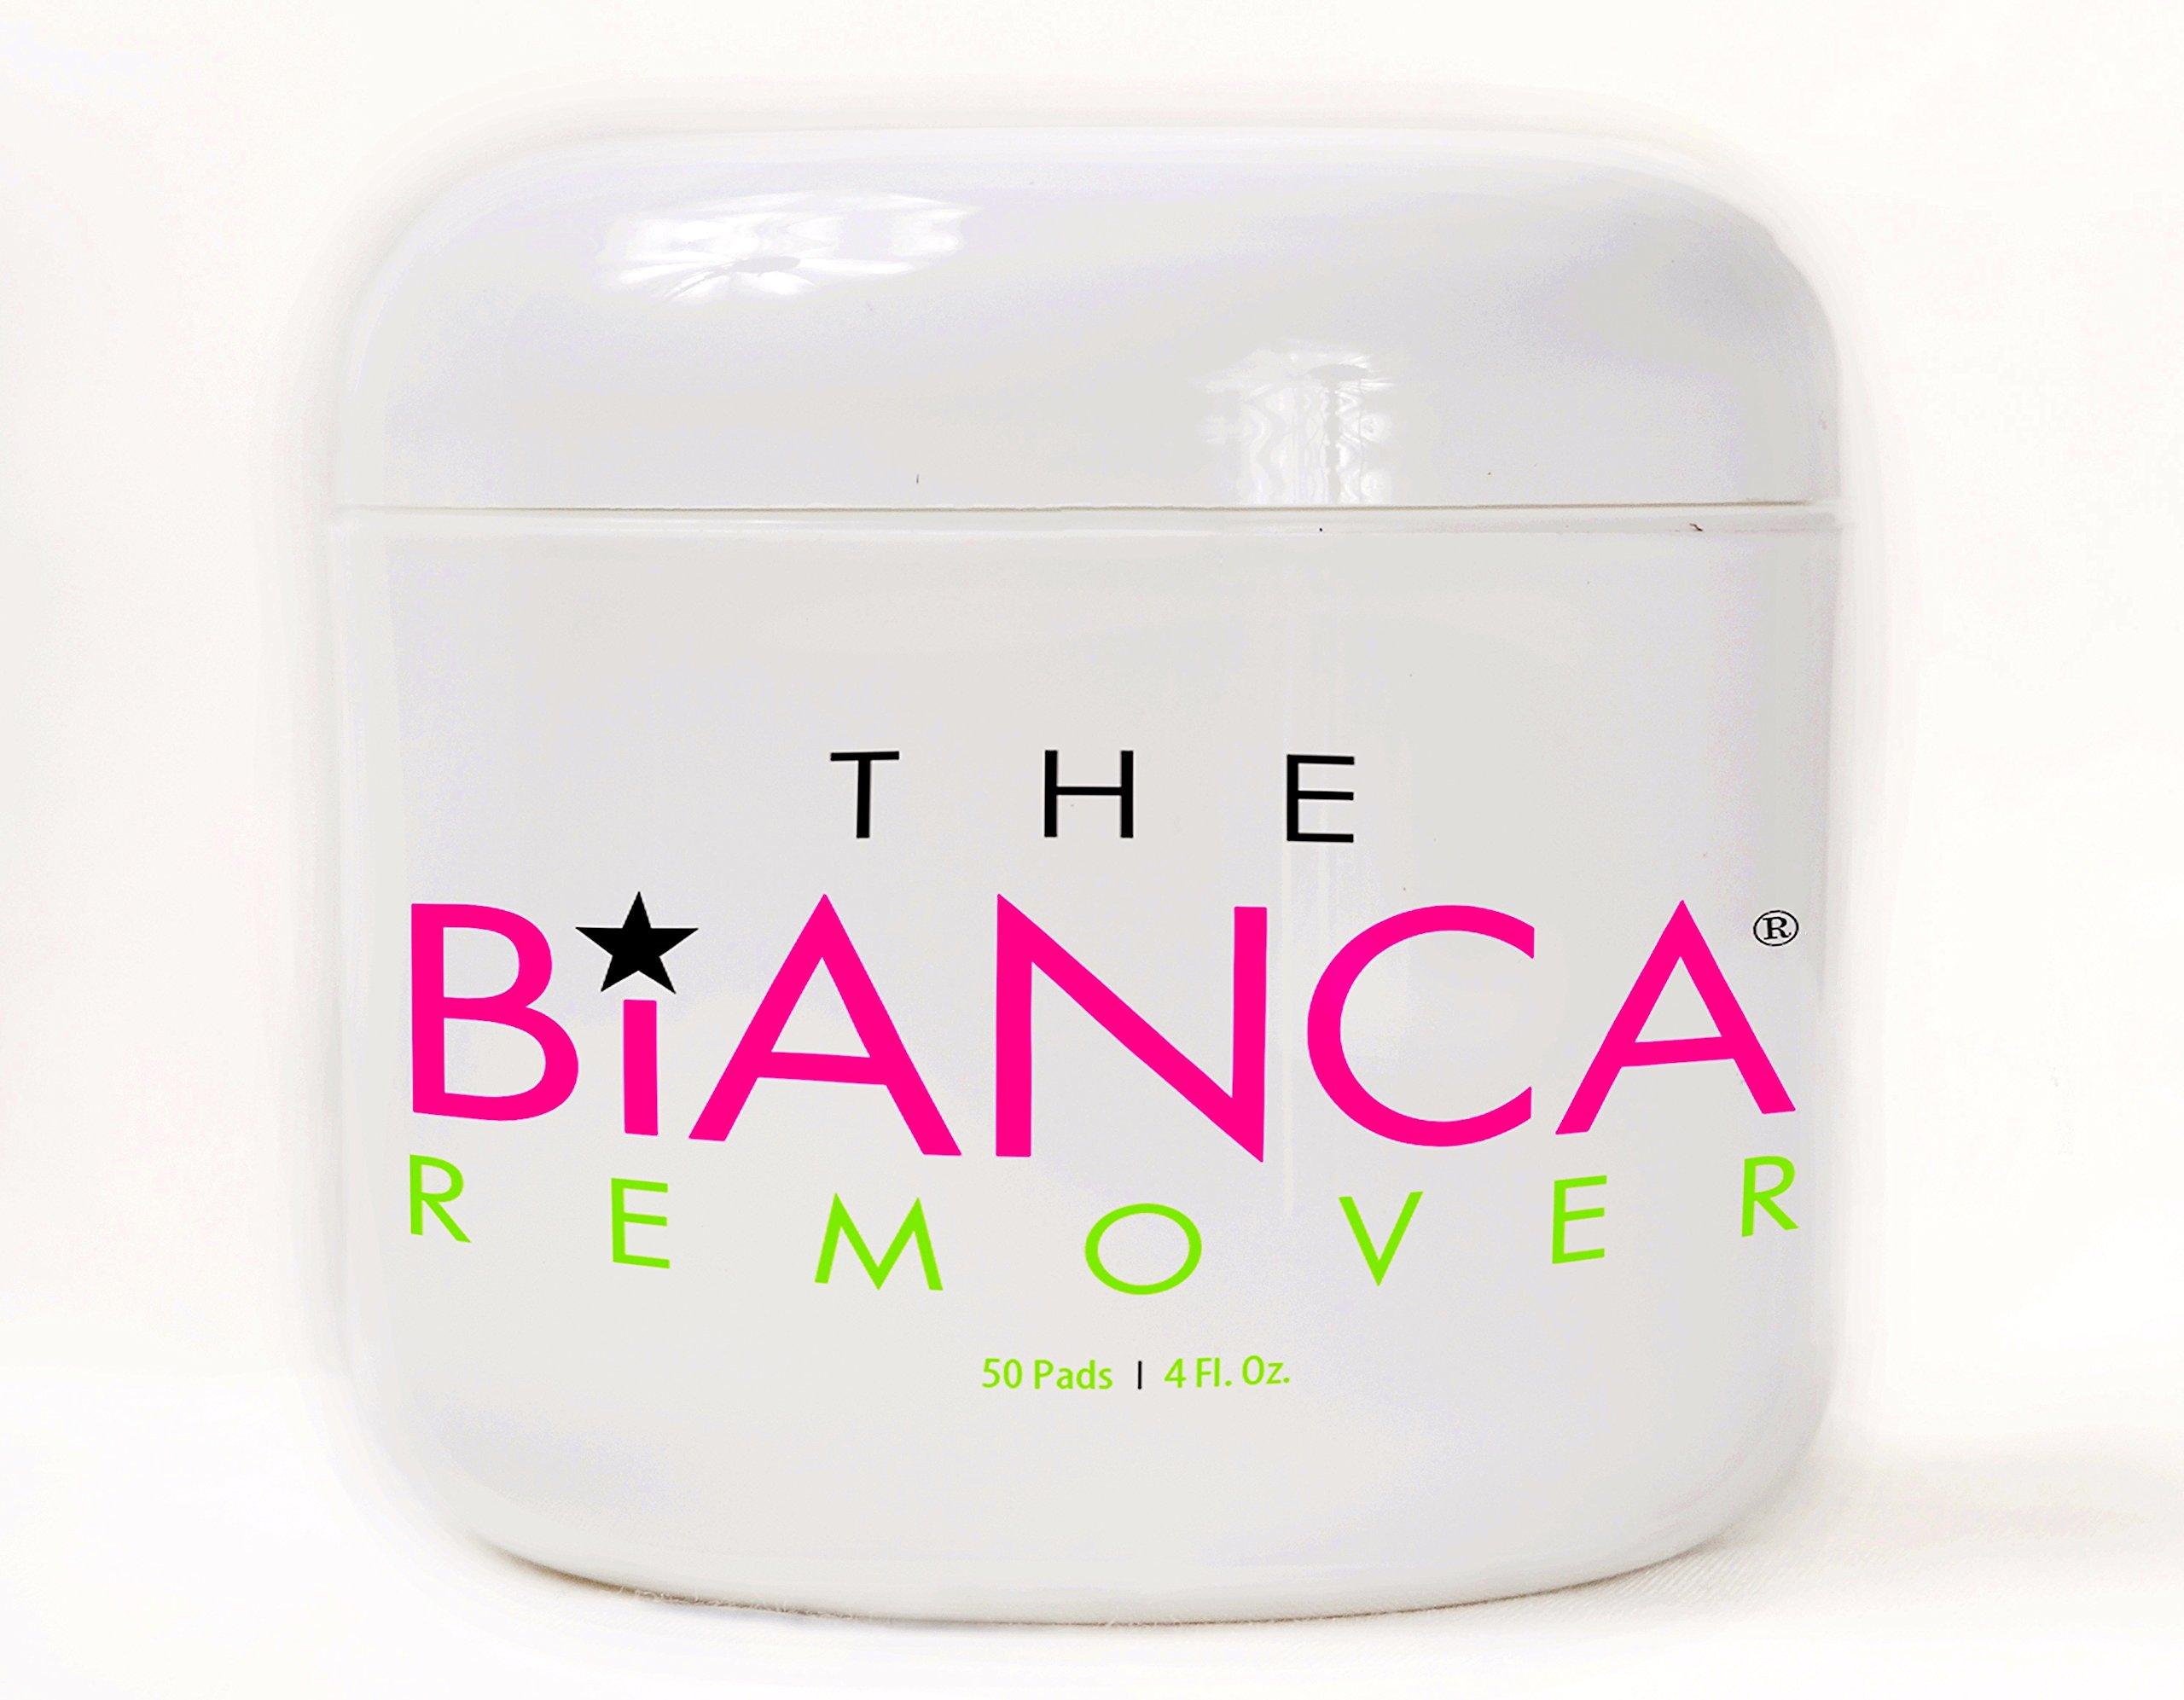 The Bianca Remover by Bianca Del Rio